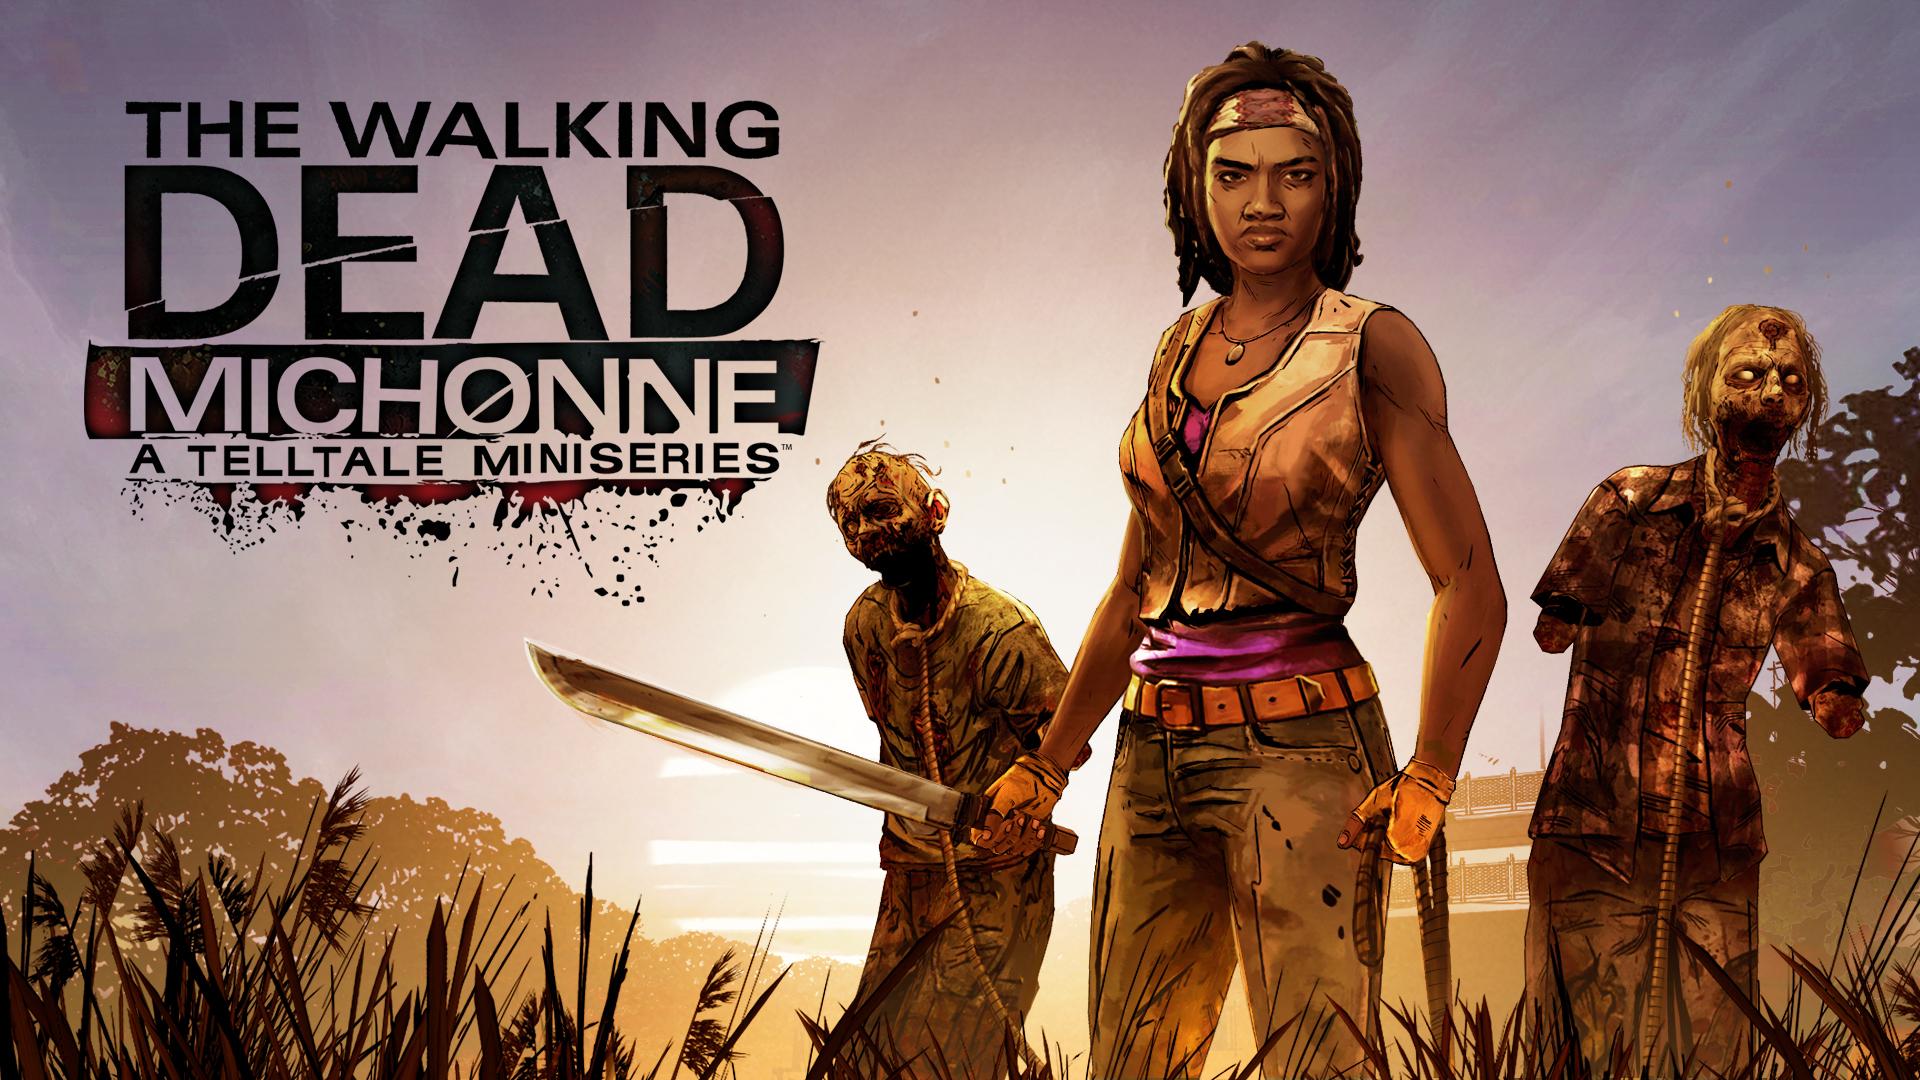 Most Viewed The Walking Dead Michonne Wallpapers 4k Wallpapers